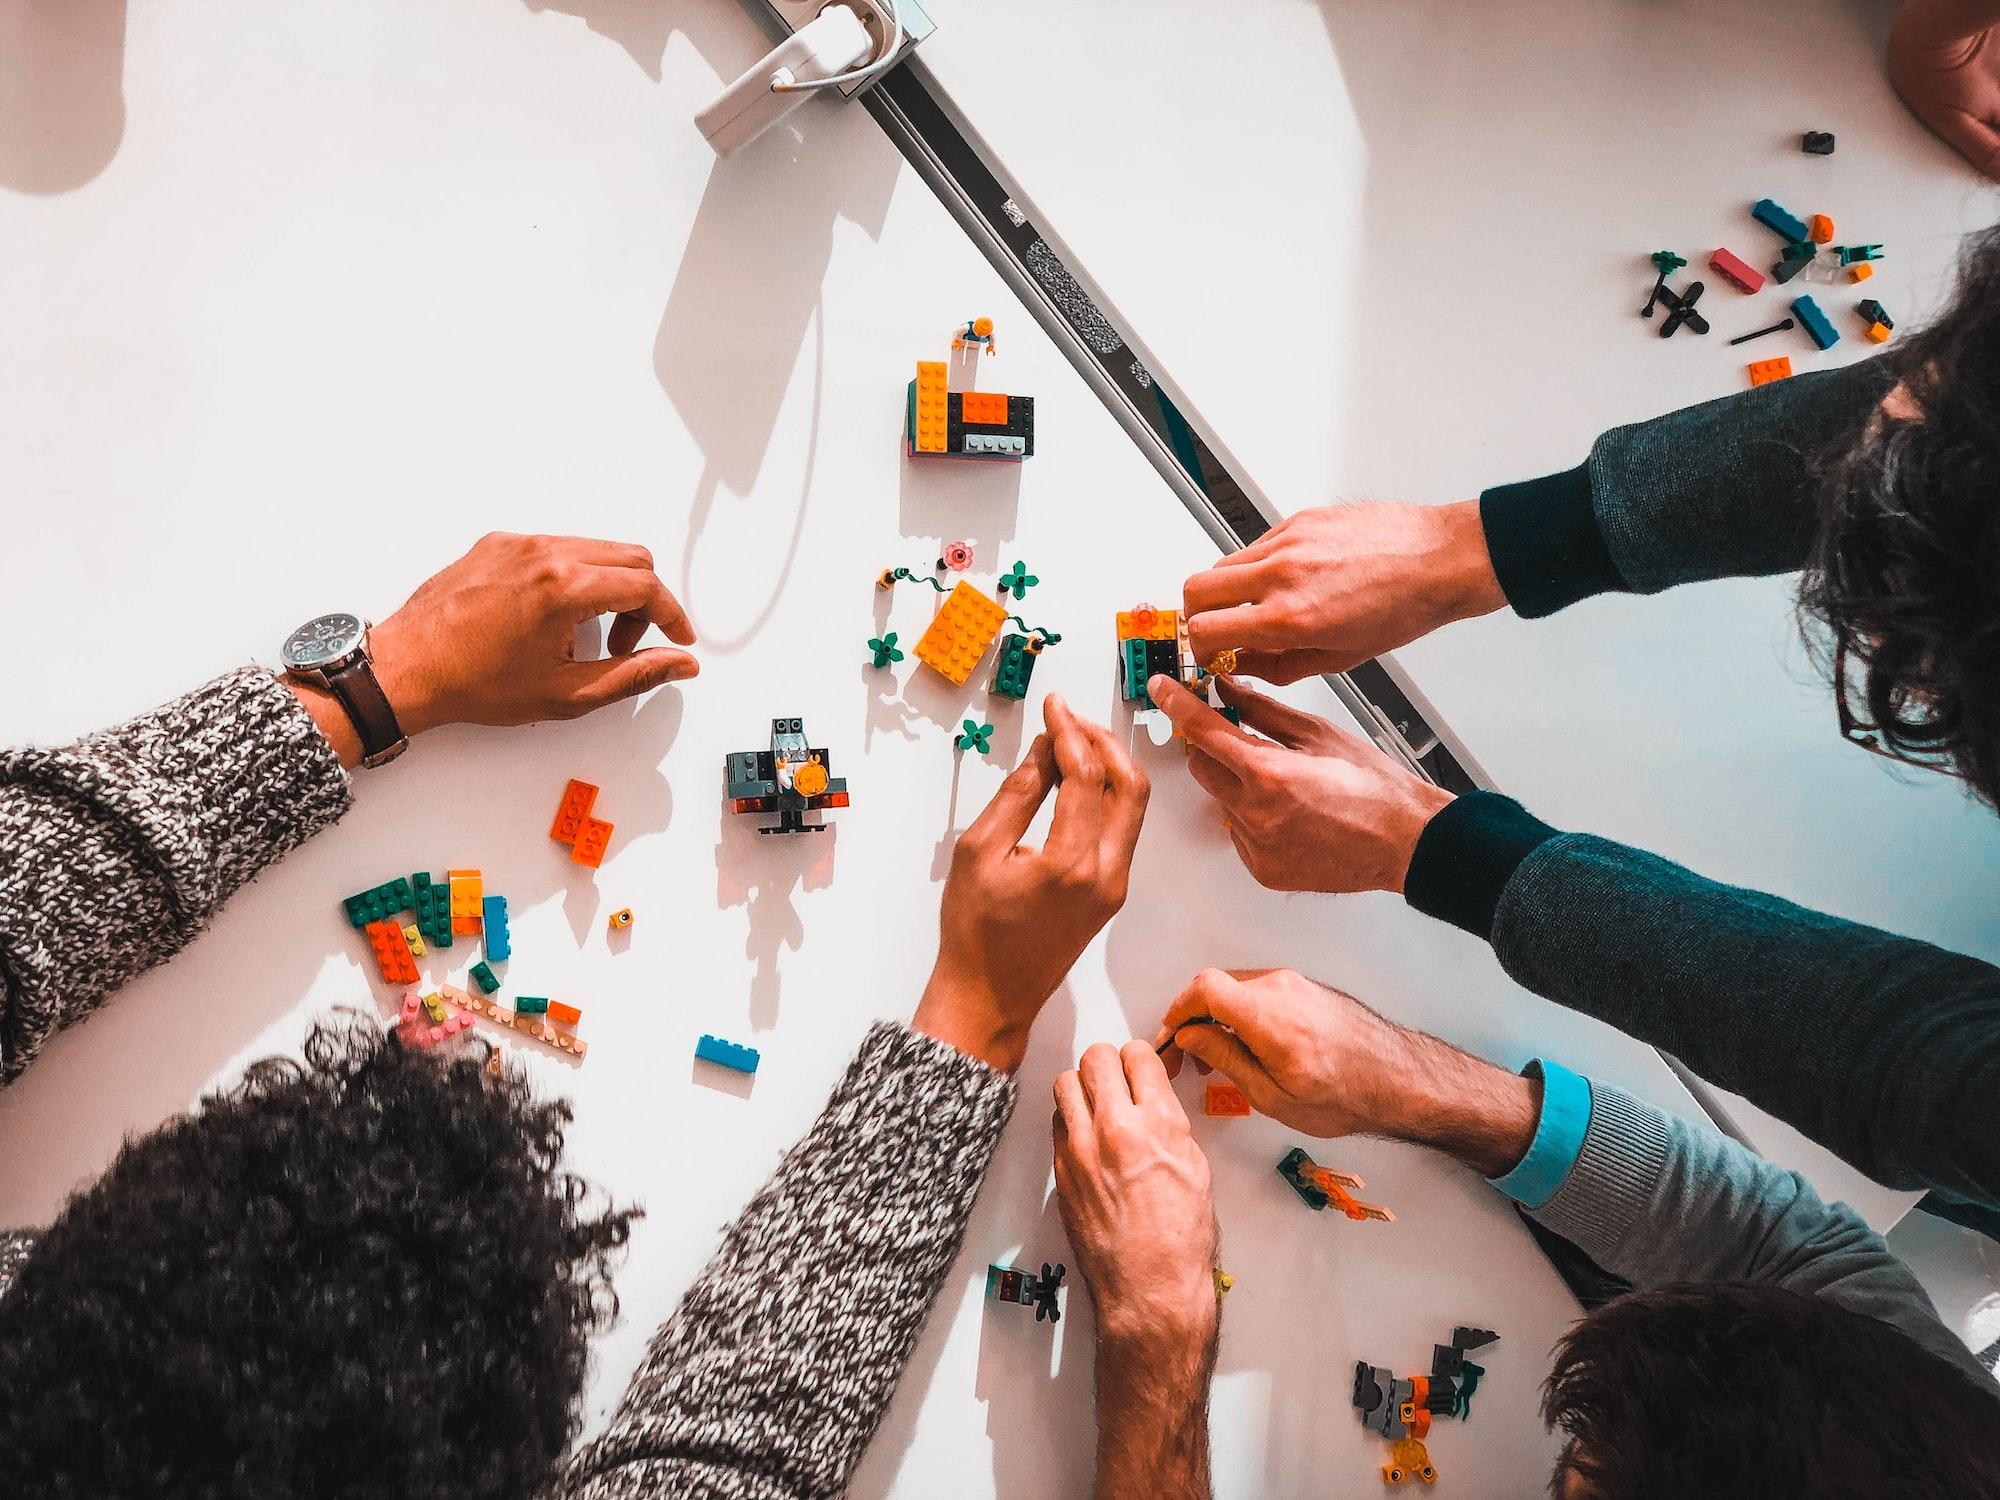 Team building Lego model